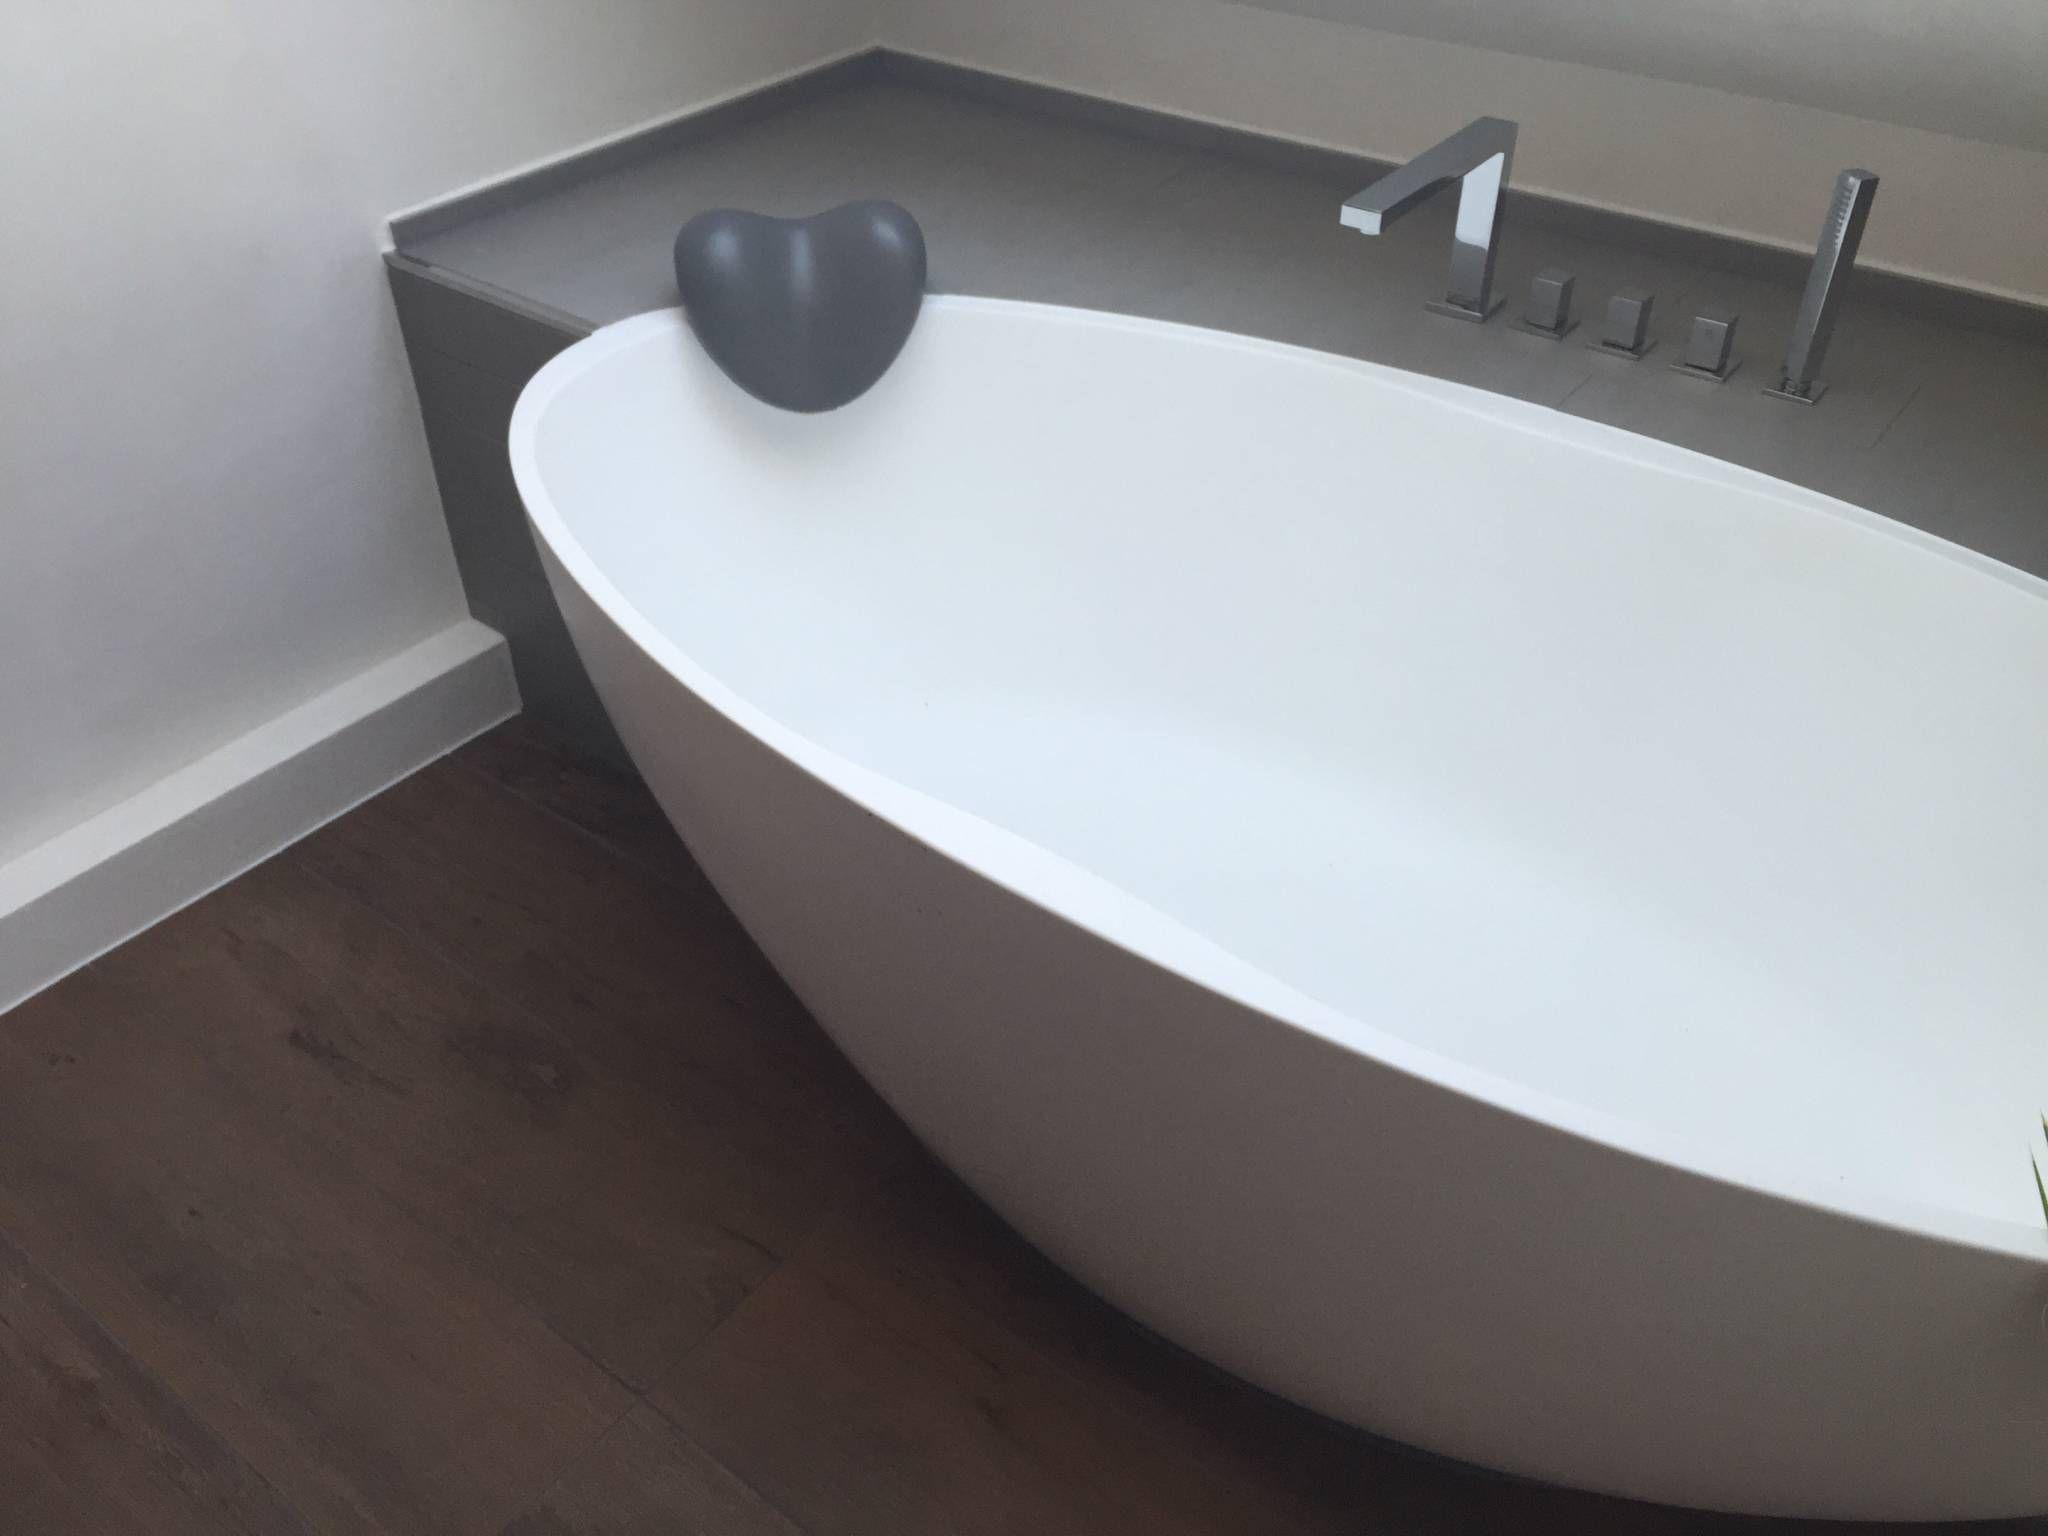 Great Snap Shots Basement Bathroom Renovations Strategies In 2020 Bathtub Remodel Basement Bathroom Design